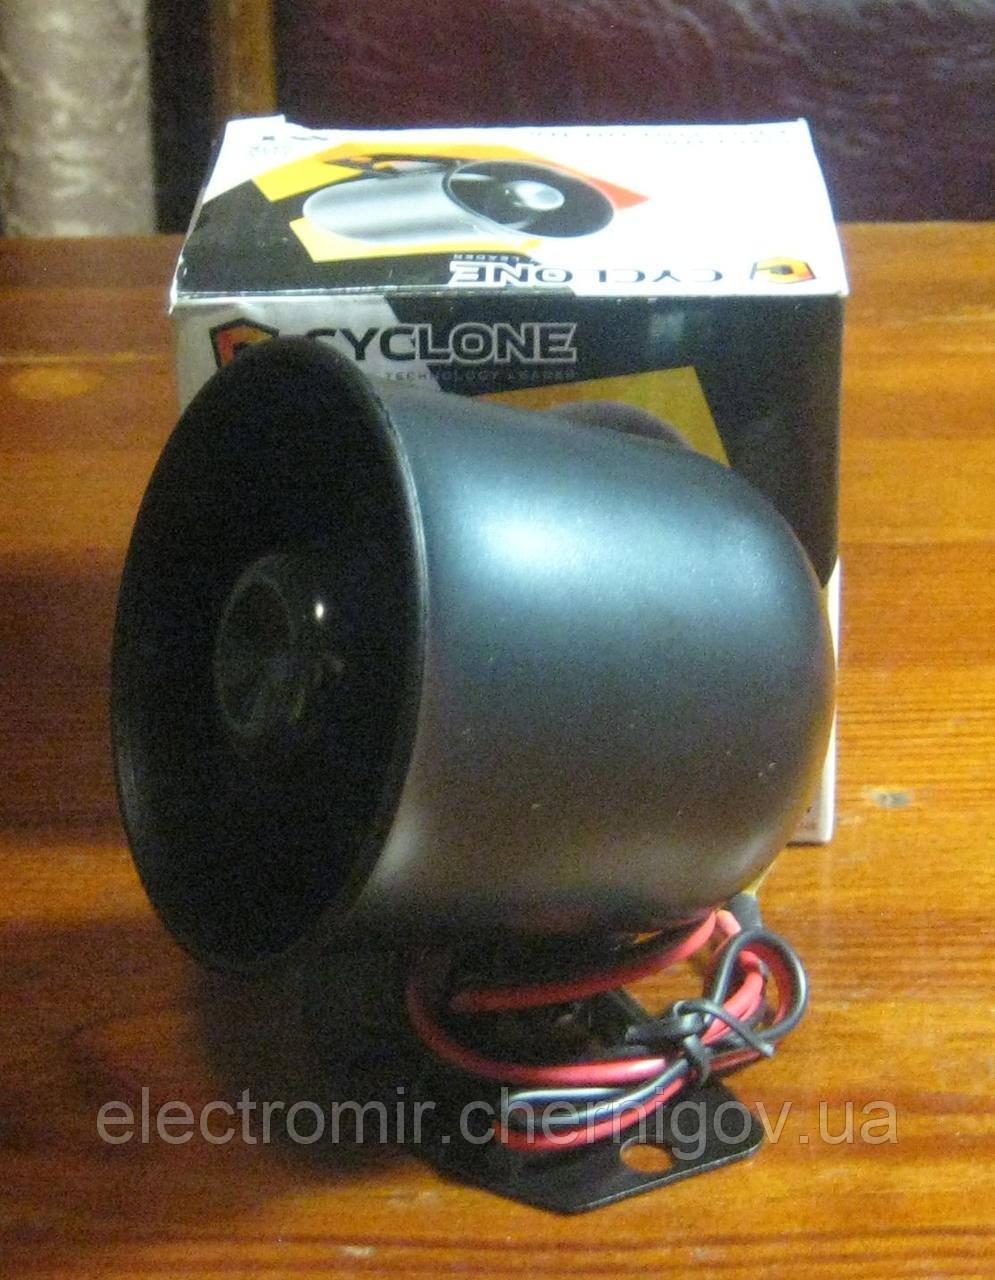 Сирена автомобильная Cyclone S-71 (20 W)